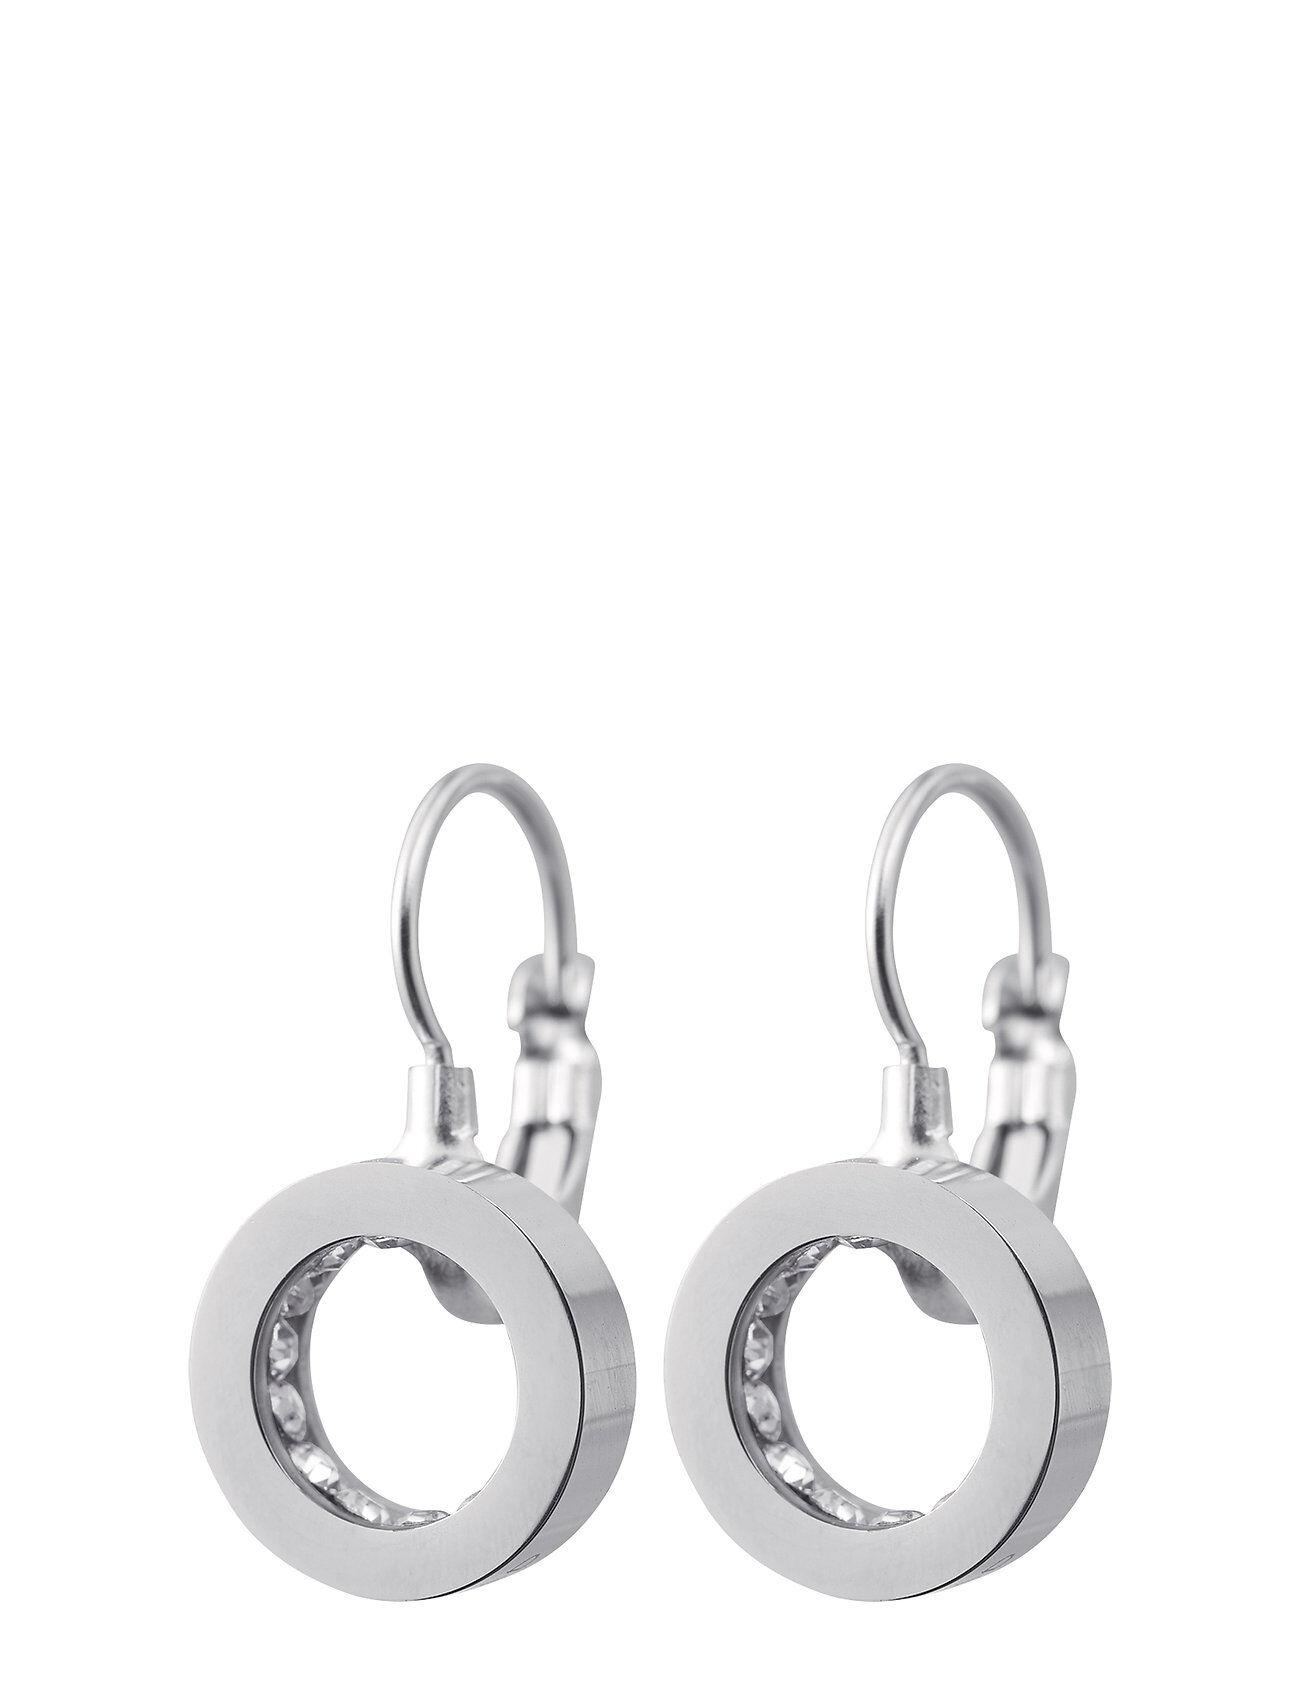 Edblad Monaco Earrings French Hook Korvakoru Korut Hopea Edblad